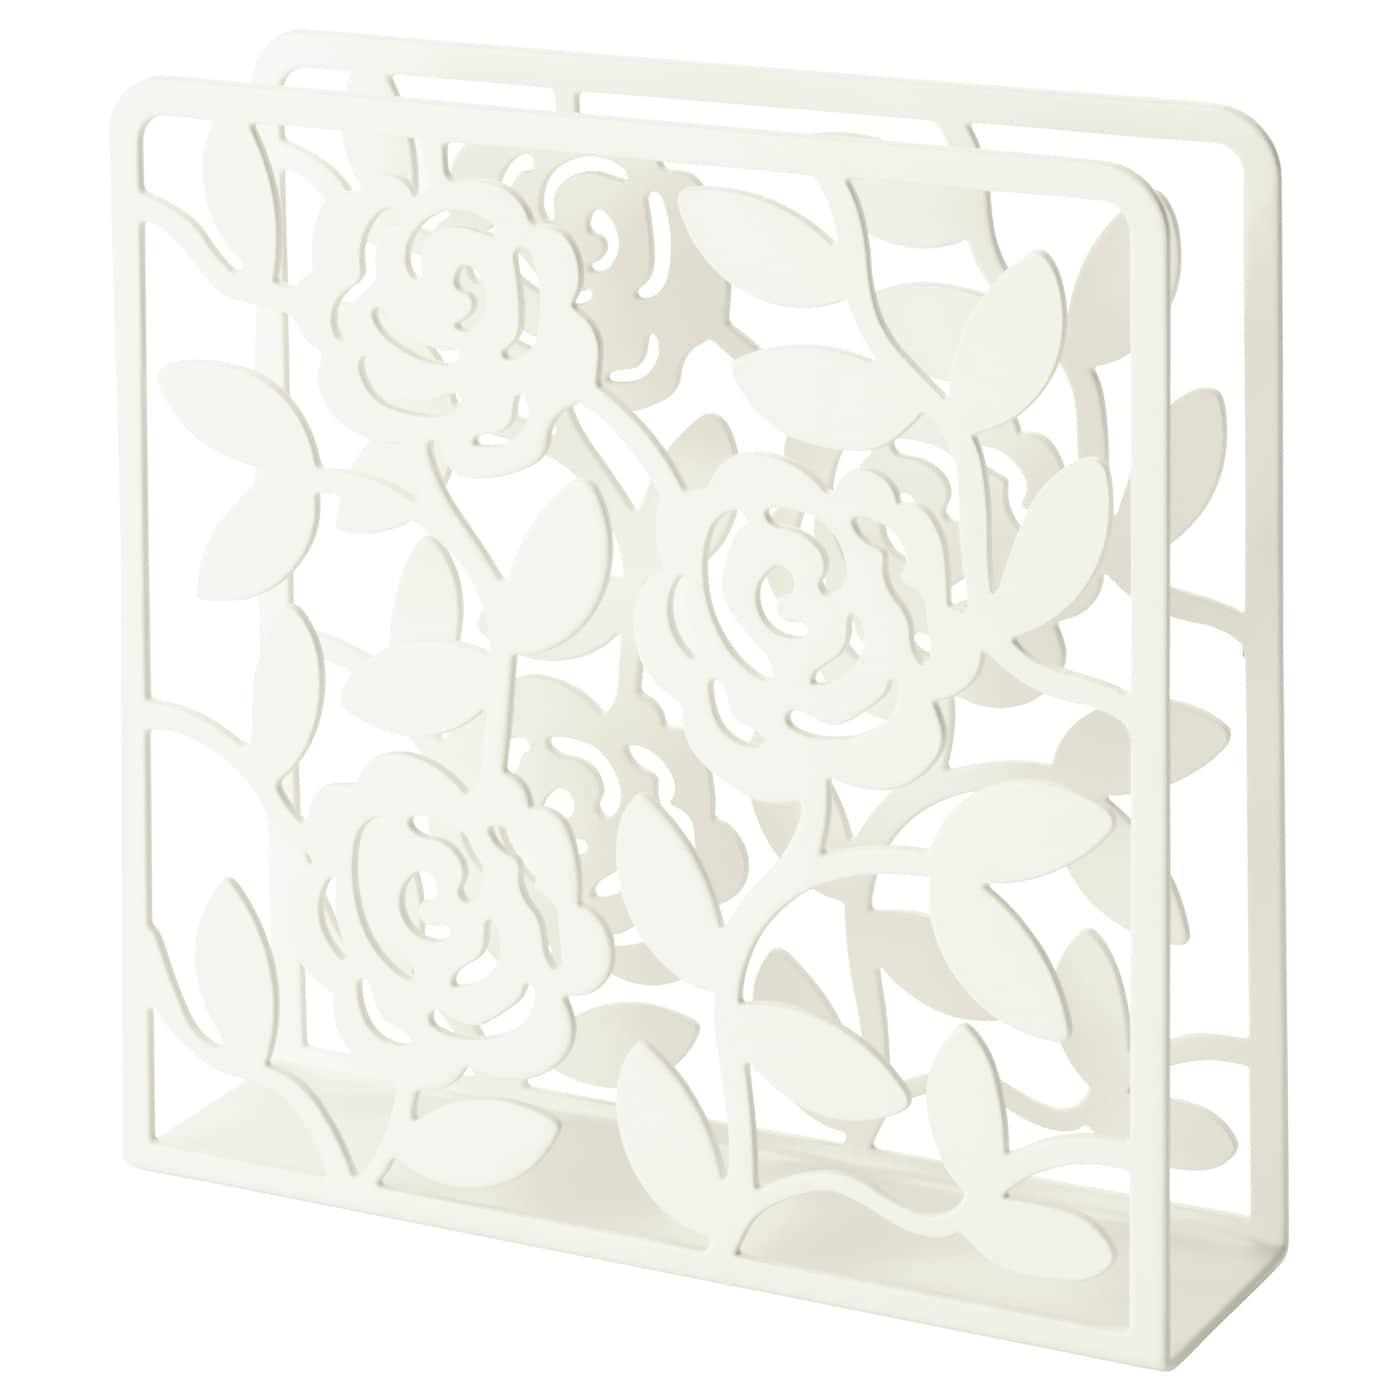 Liksidig Porte Serviettes Blanc 16x16 Cm Ikea